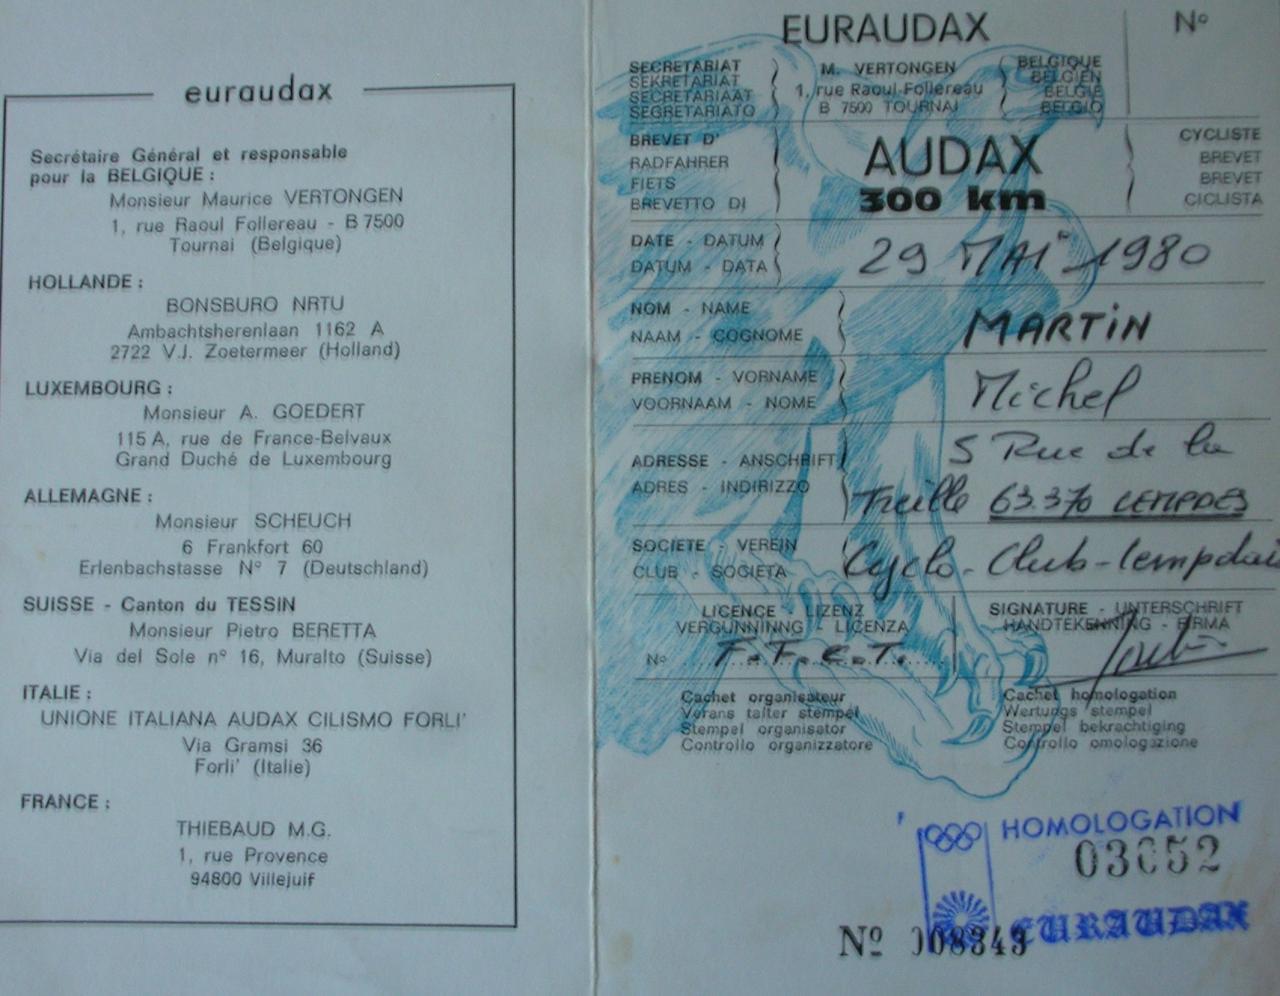 1980-brevet-audax-de-300-kms-du-29-mai.jpg